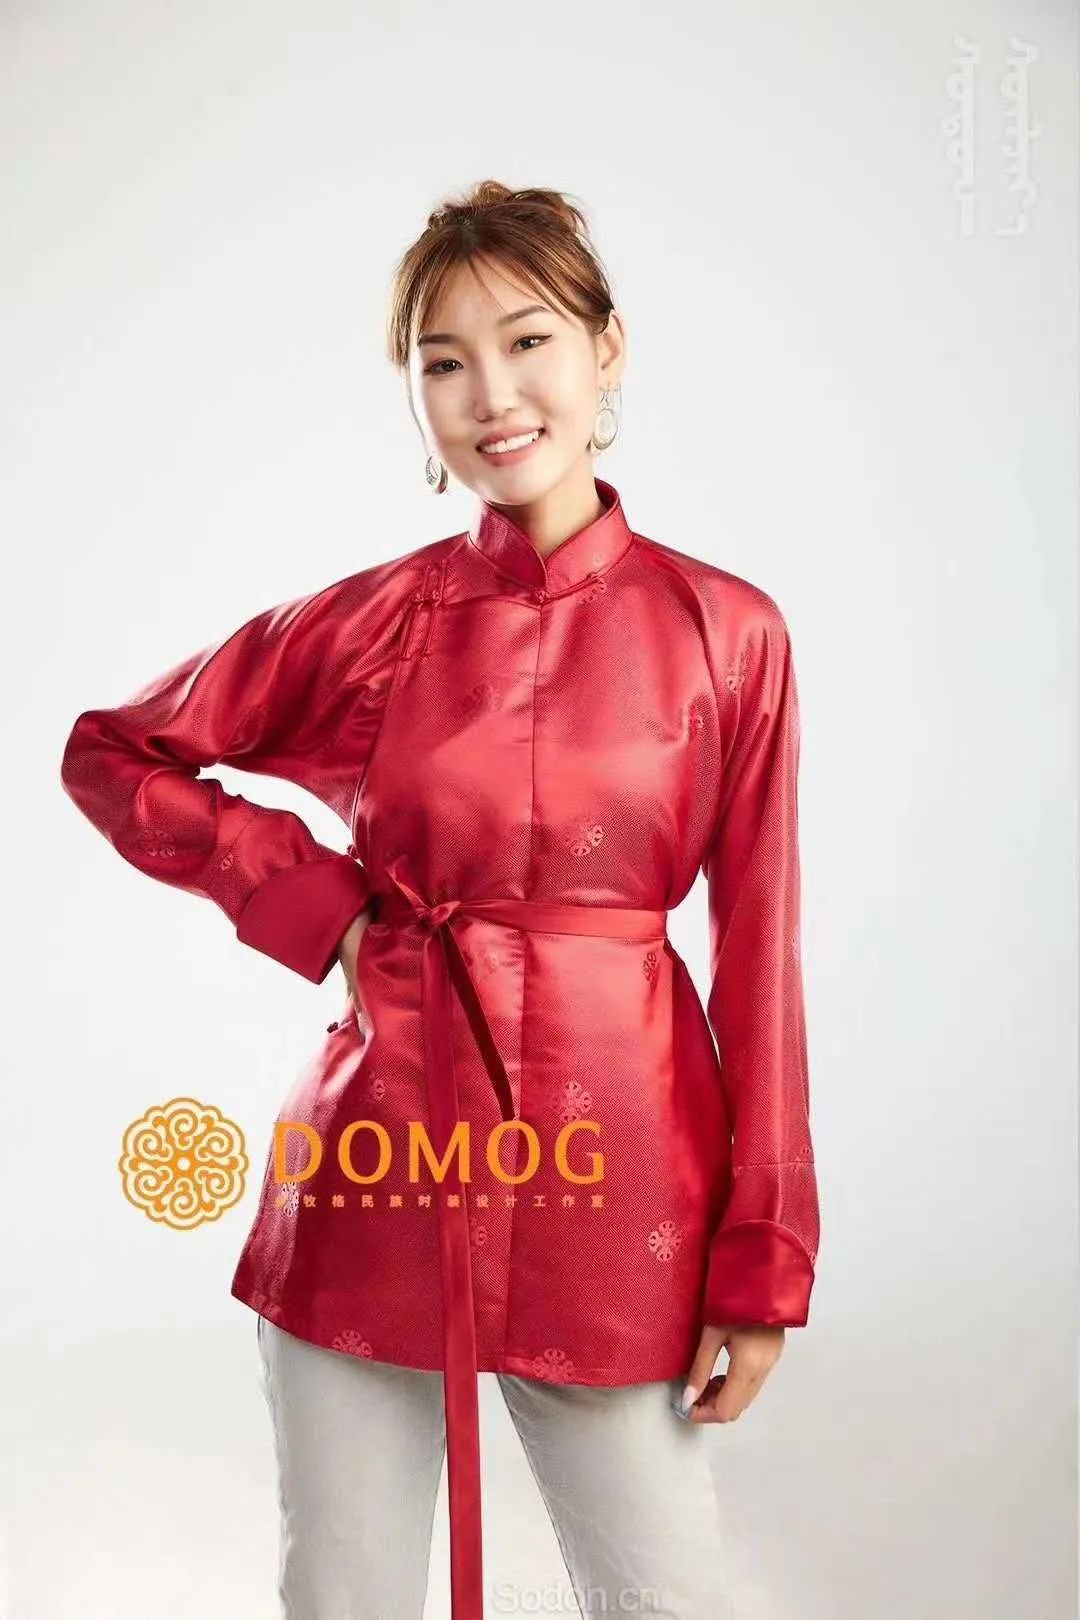 DOMOG 蒙古时装2020新款,民族与时尚的融合 第39张 DOMOG 蒙古时装2020新款,民族与时尚的融合 蒙古服饰